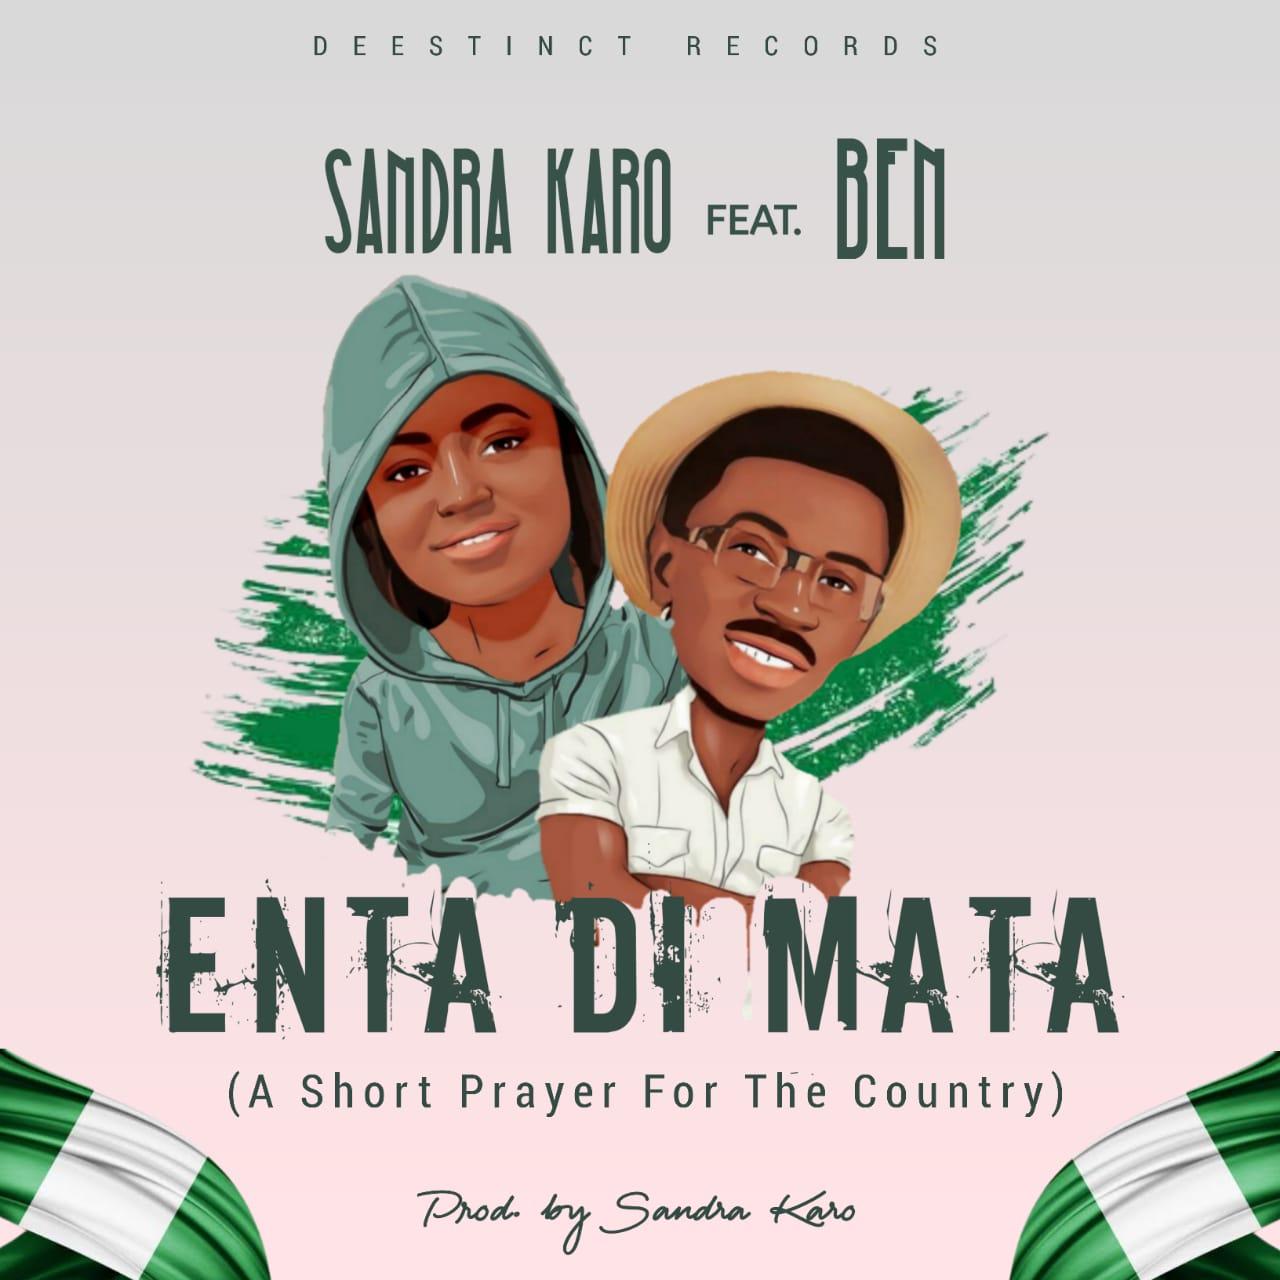 Sandra Karo - Enta Di Mata